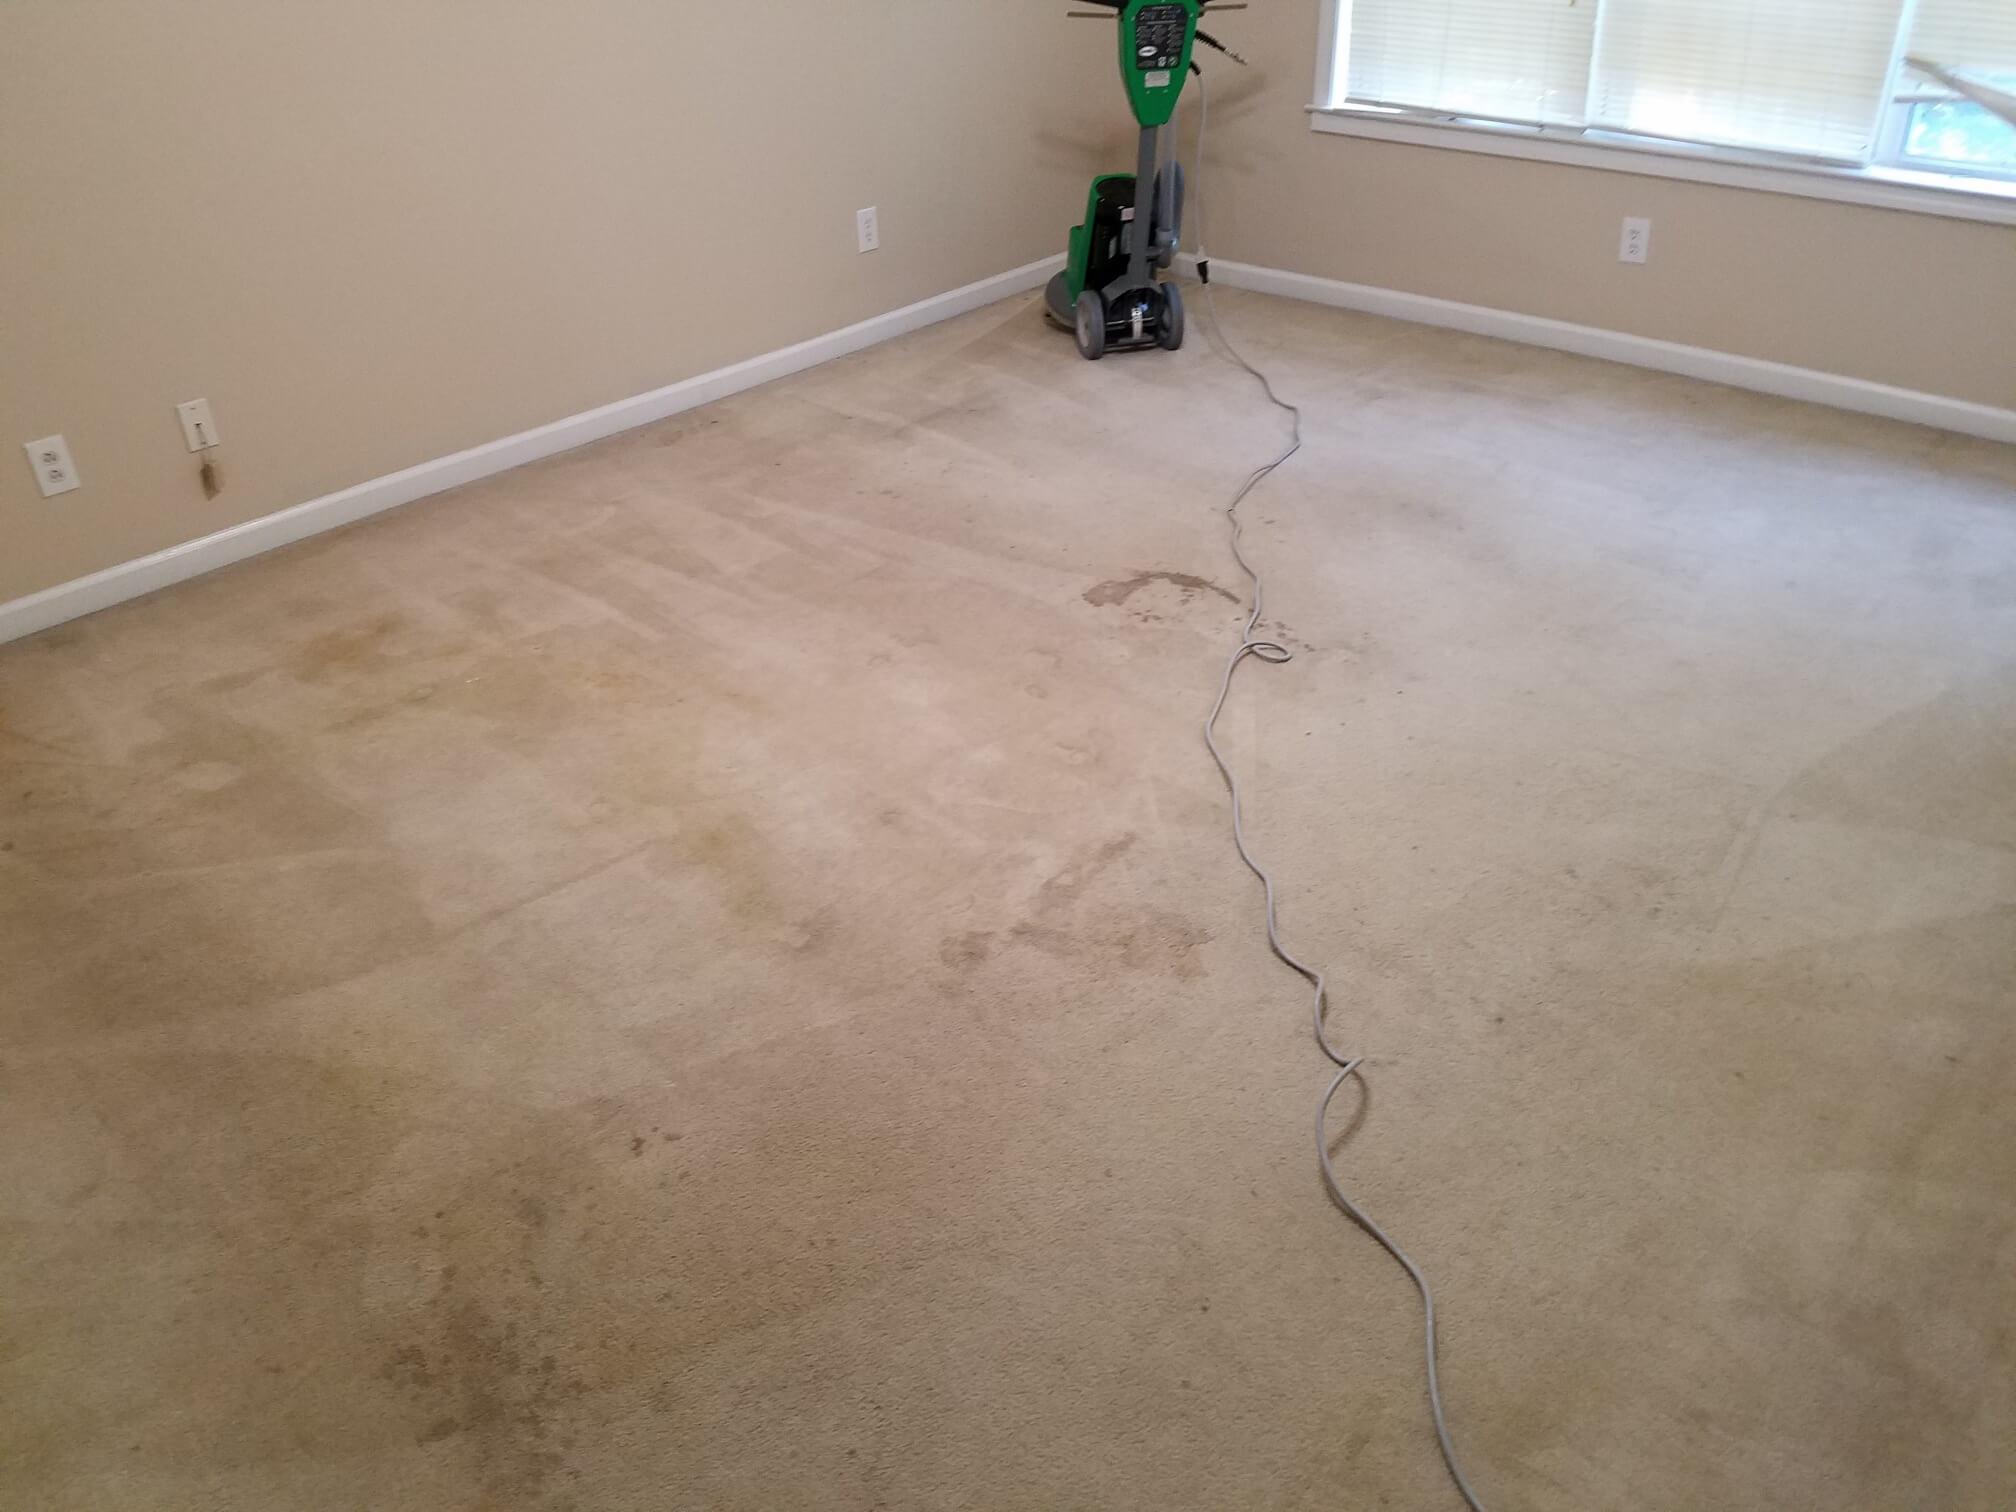 carpet cleaning team and van